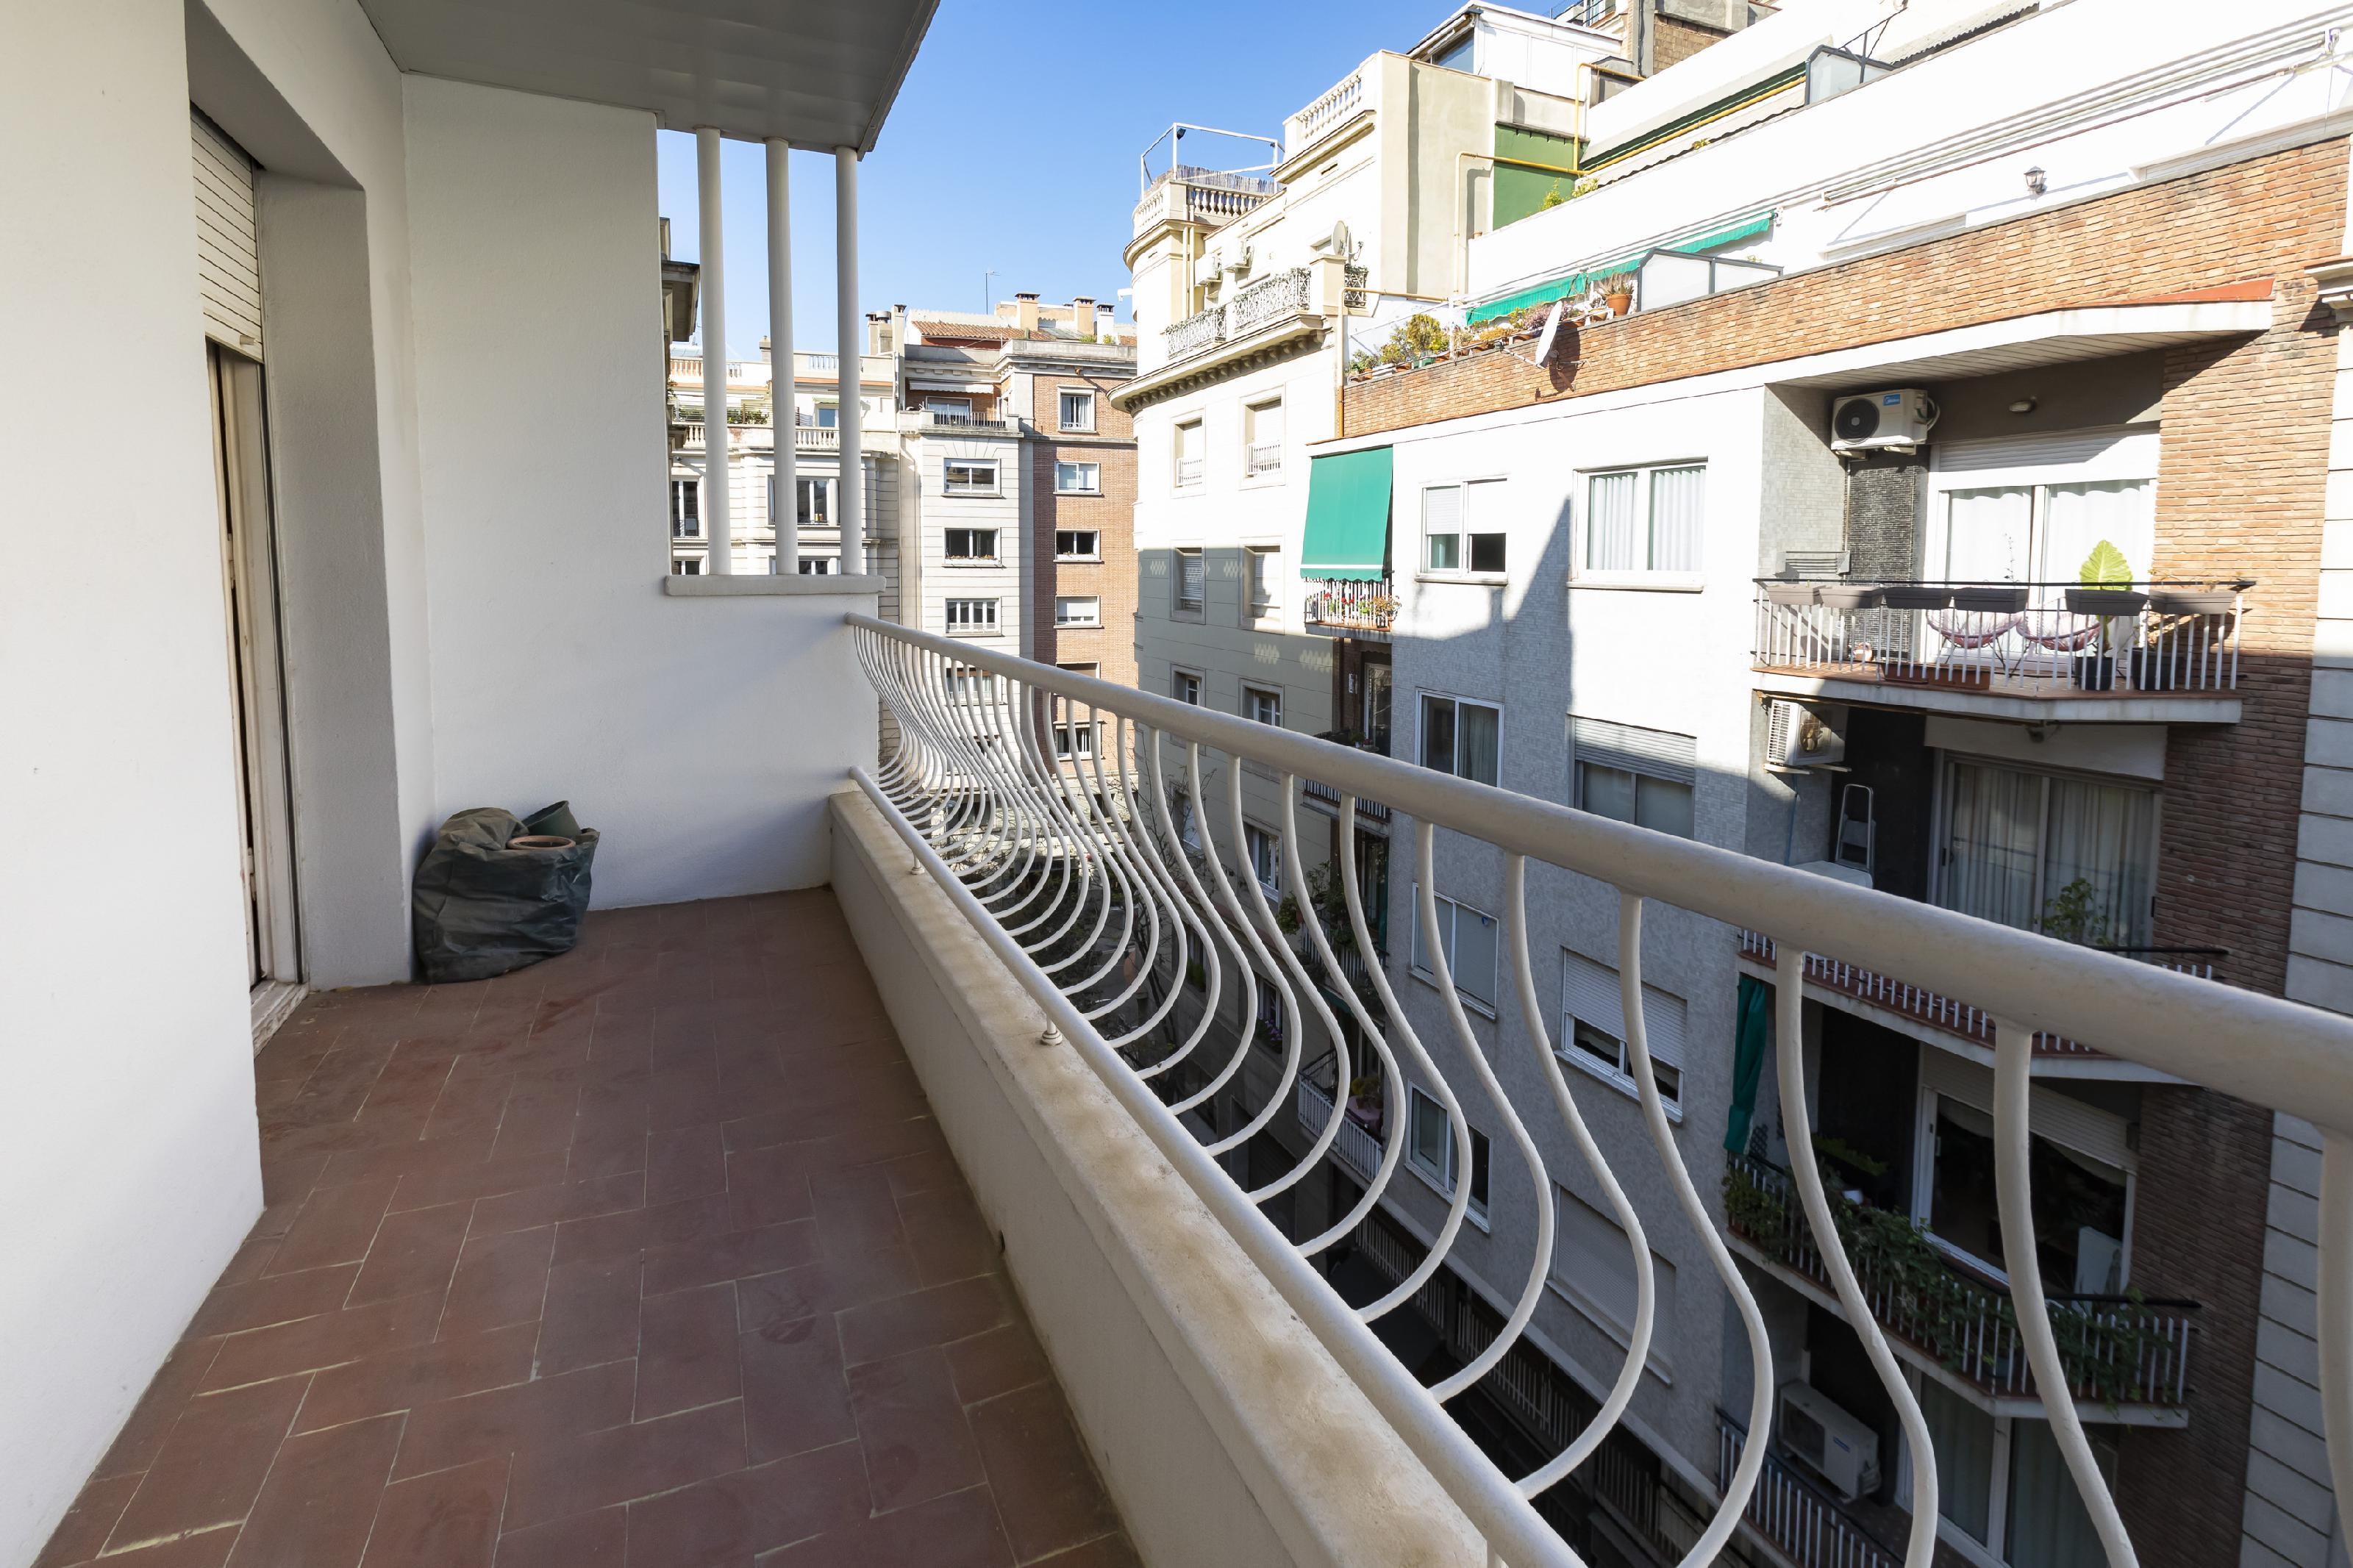 247097 Flat for sale in Sarrià-Sant Gervasi, Sant Gervasi-Galvany 21